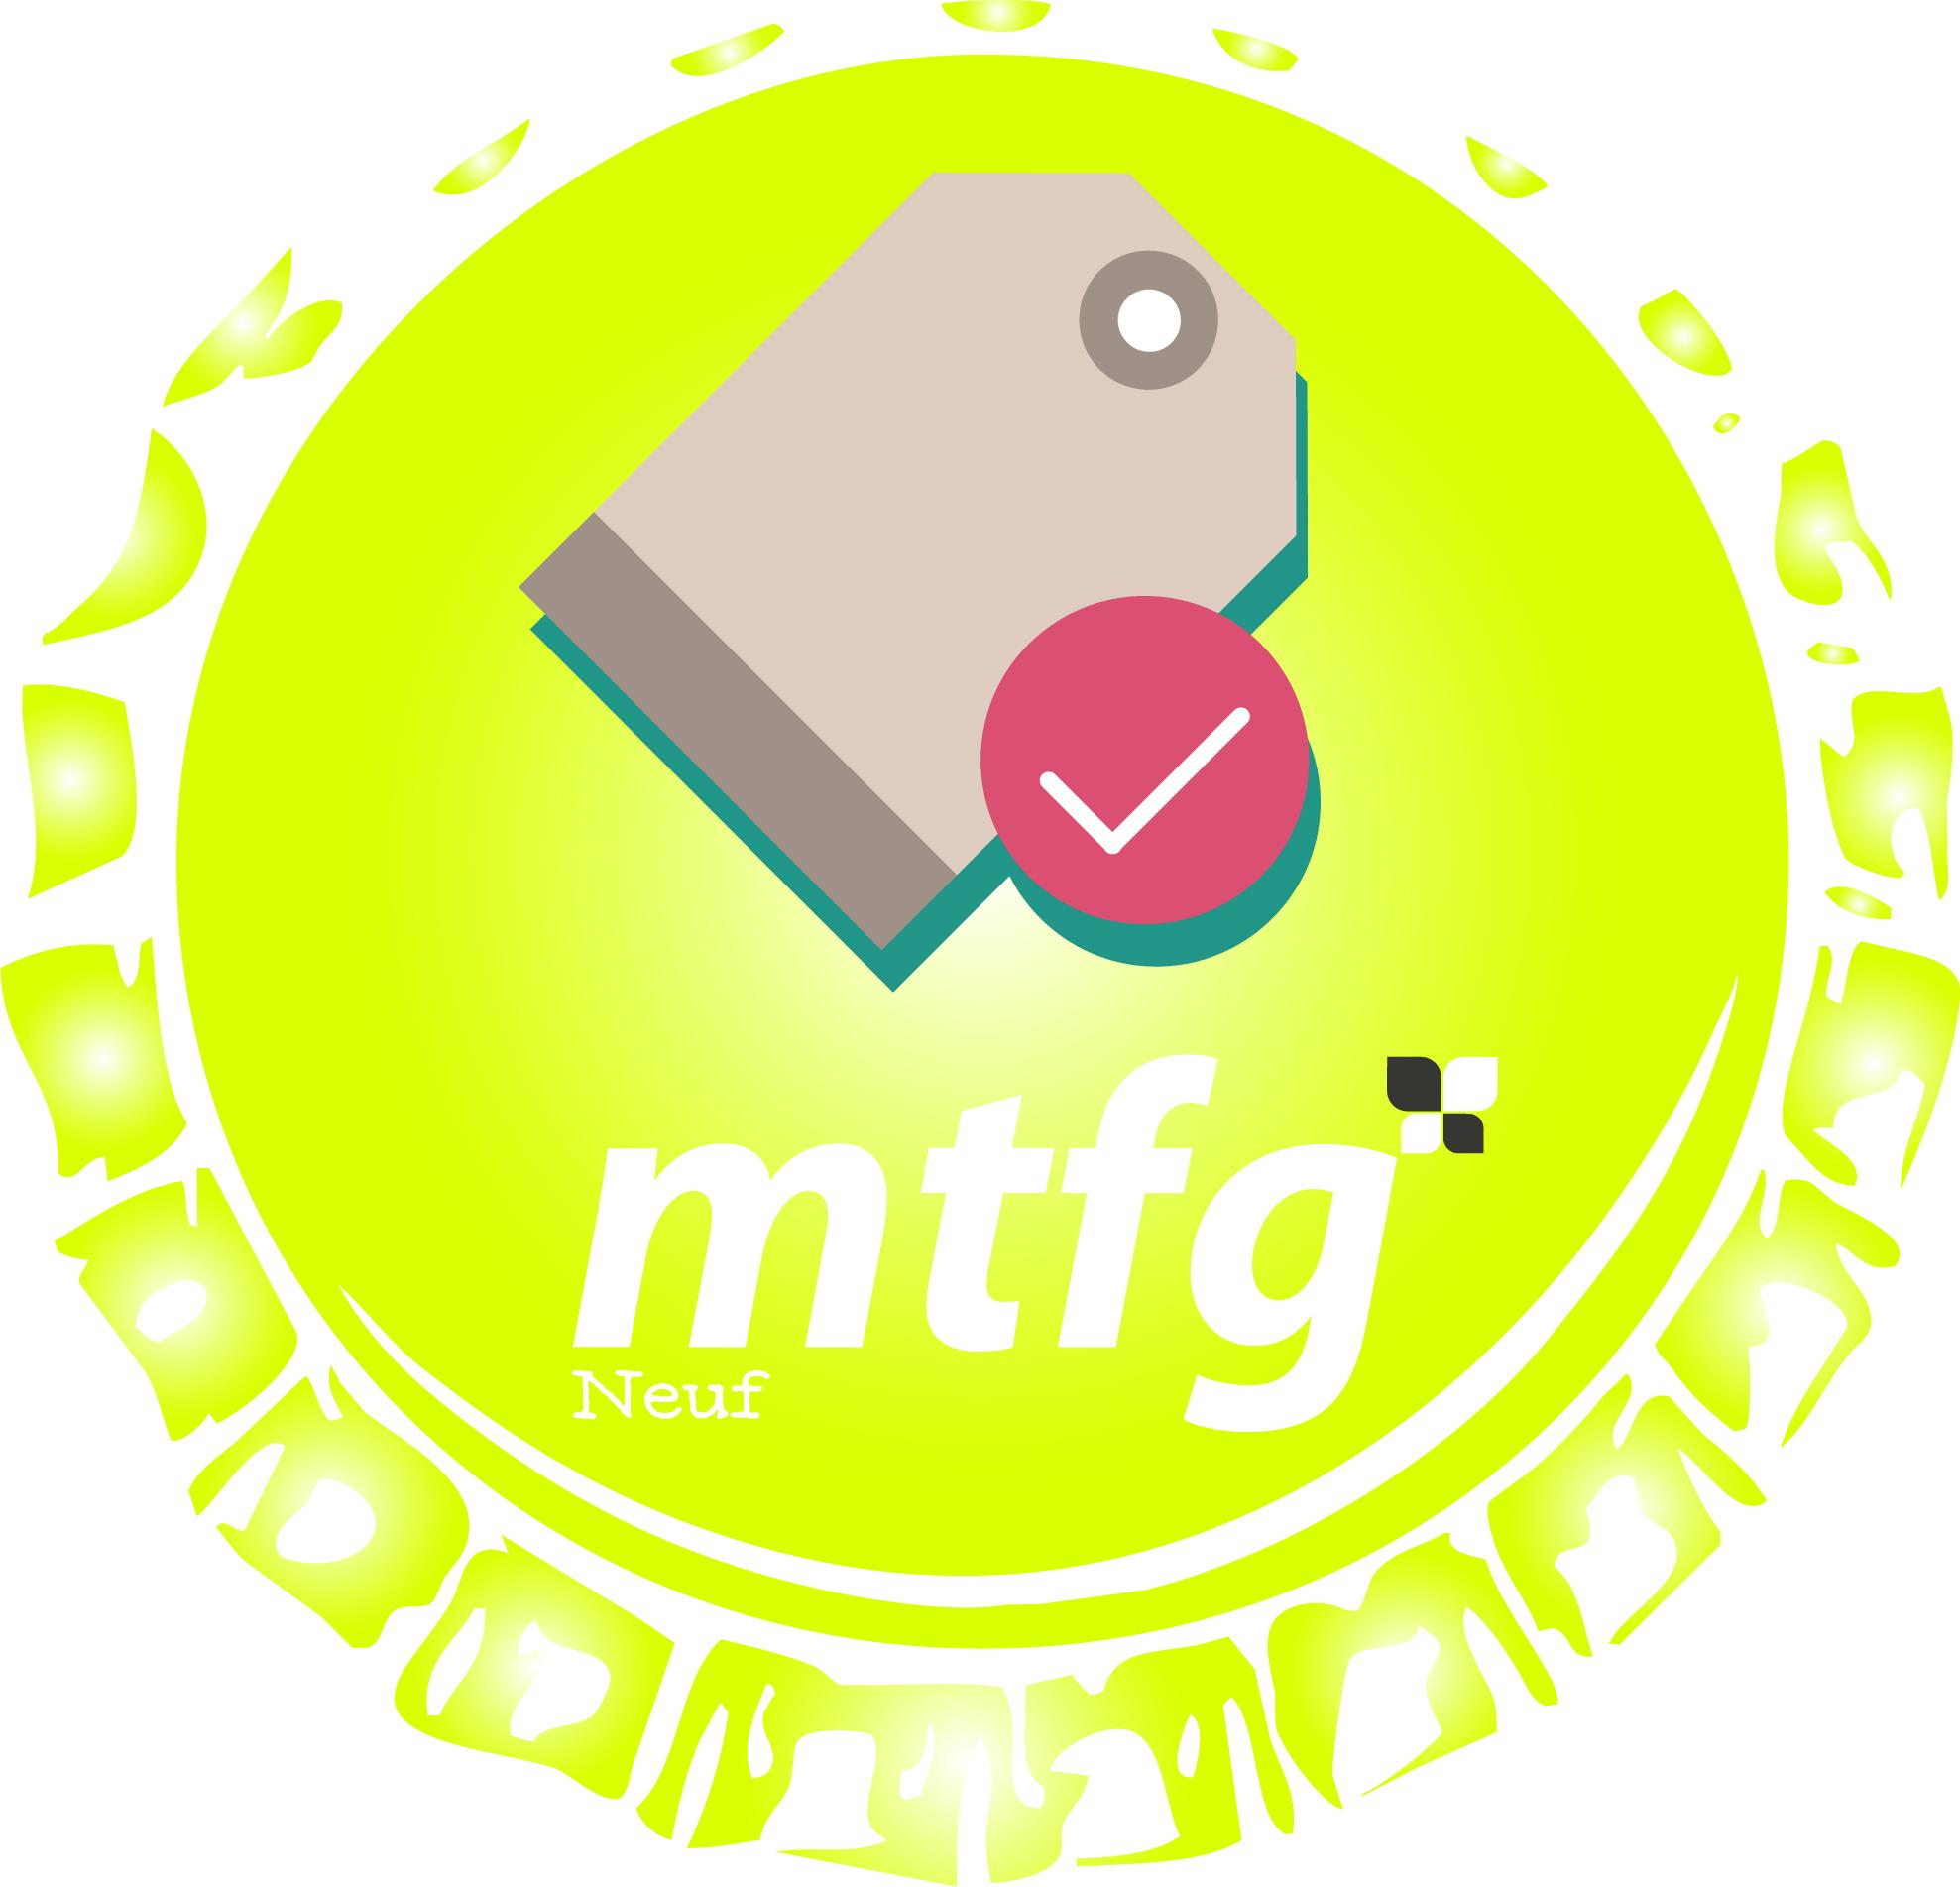 MTFG Neuf